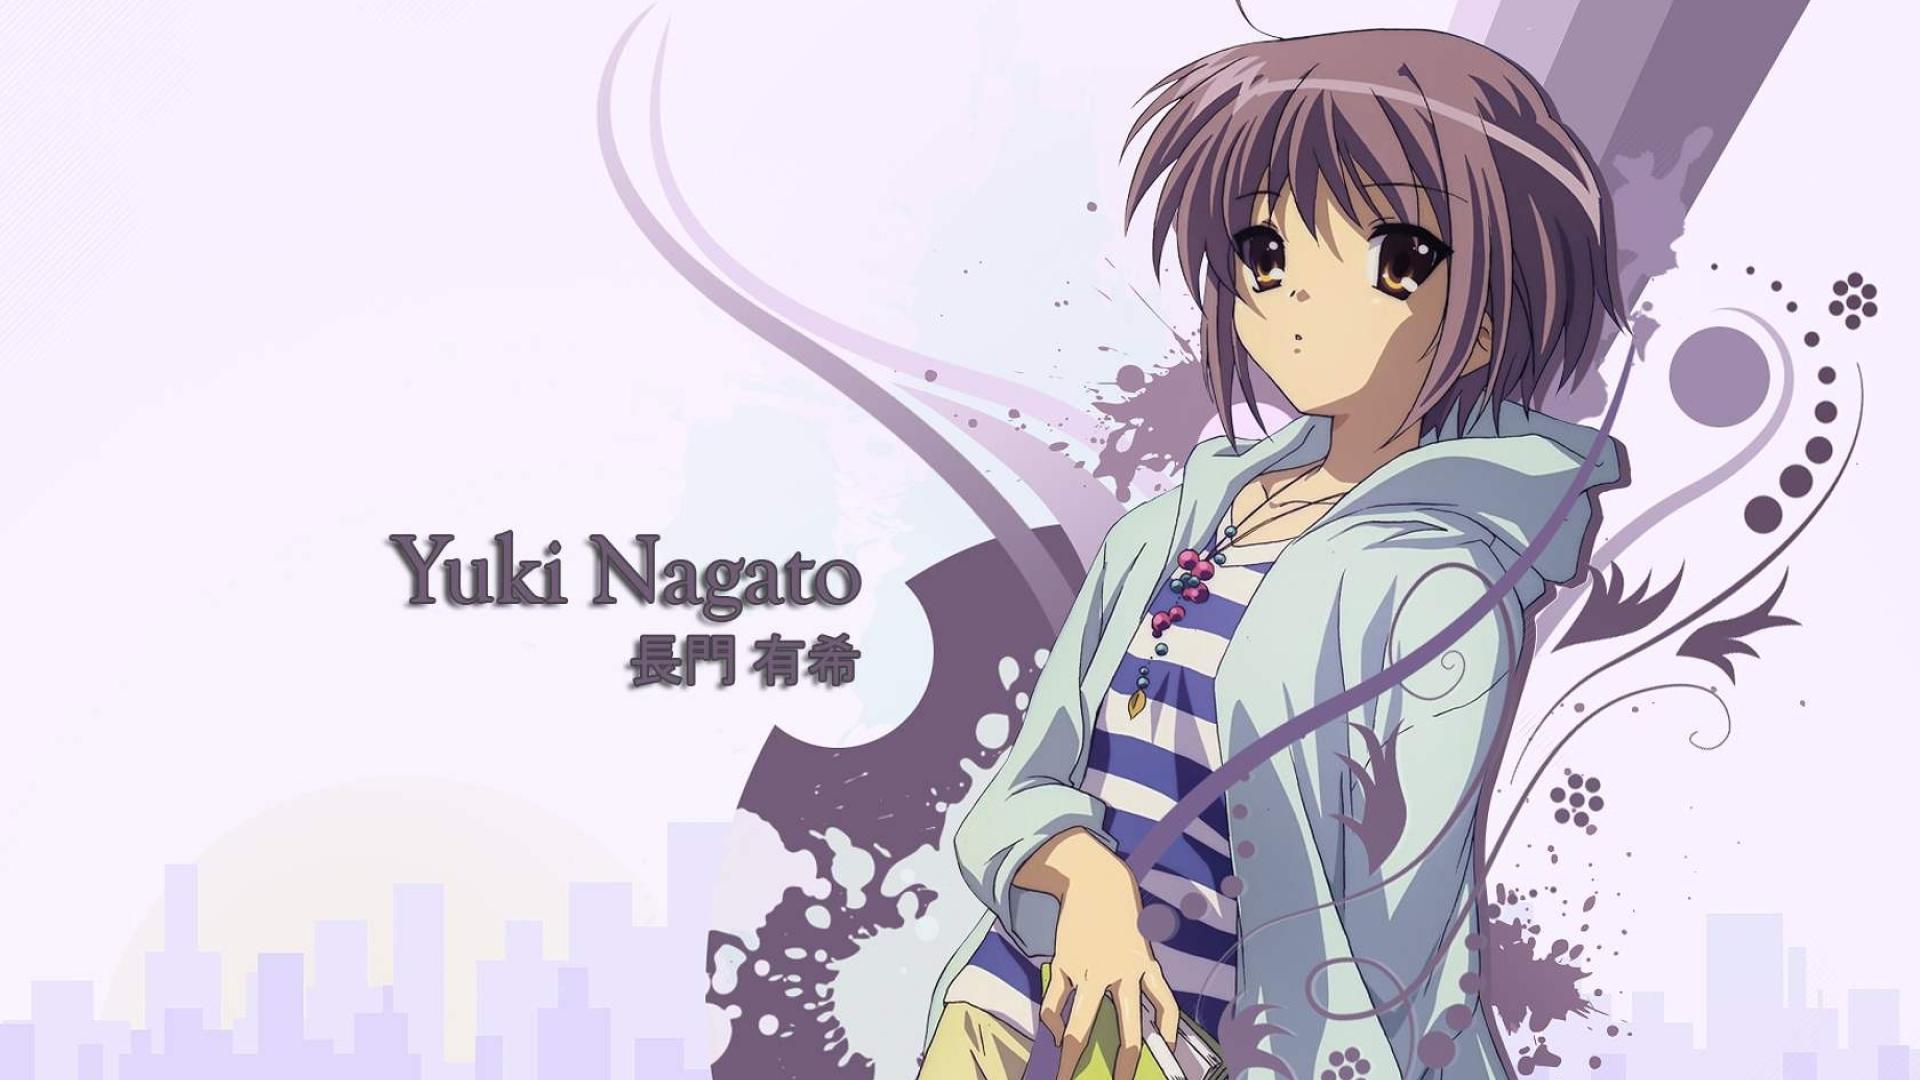 1920x1080 Yuki Nagato Girl Look 1080p Laptop Full Hd Wallpaper